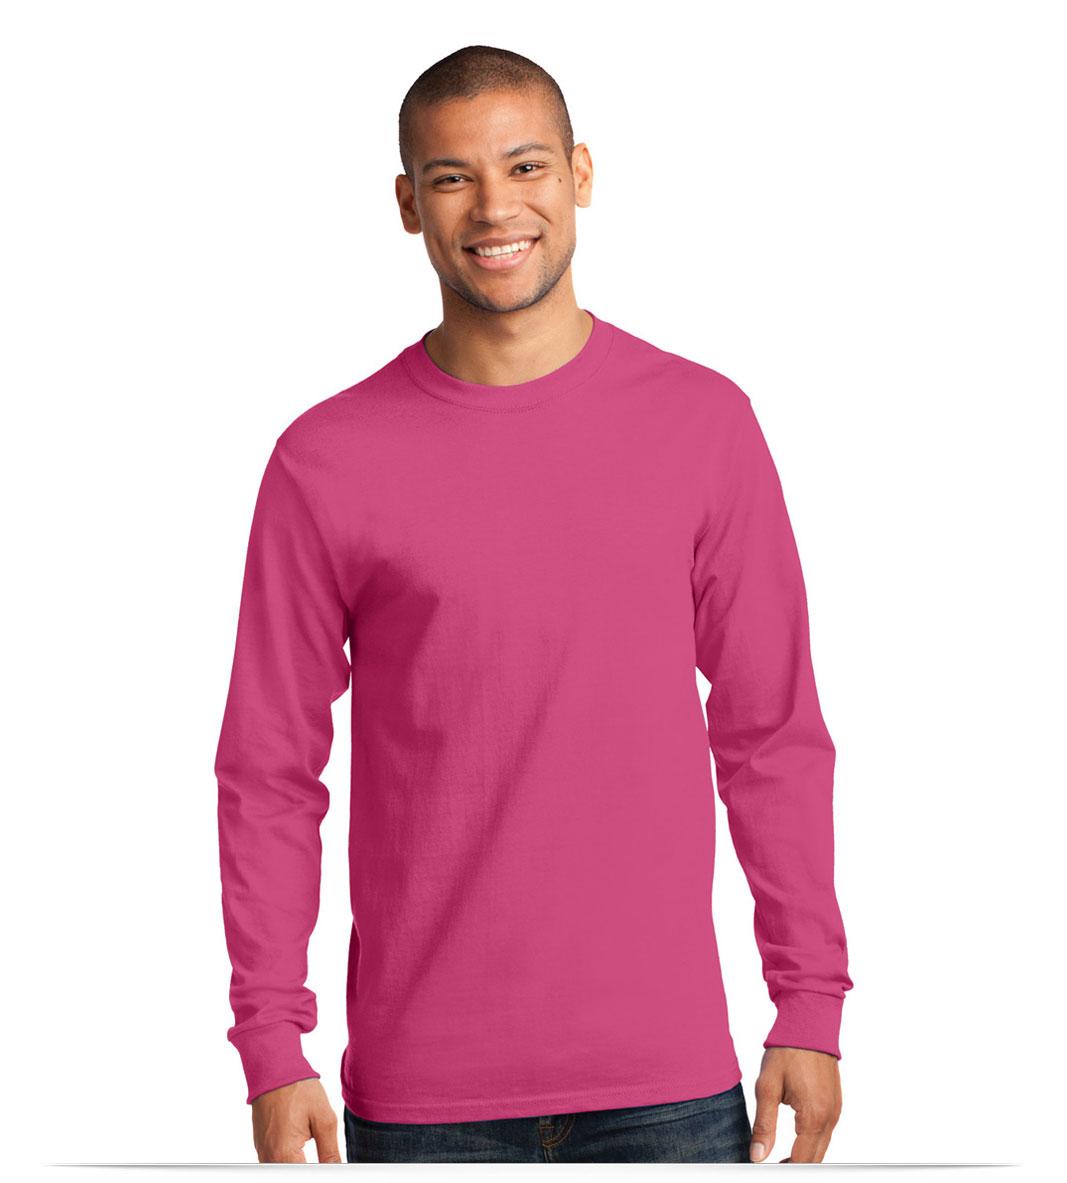 Design embroidered custom logo long sleeve t shirt online for Custom printed long sleeve t shirts